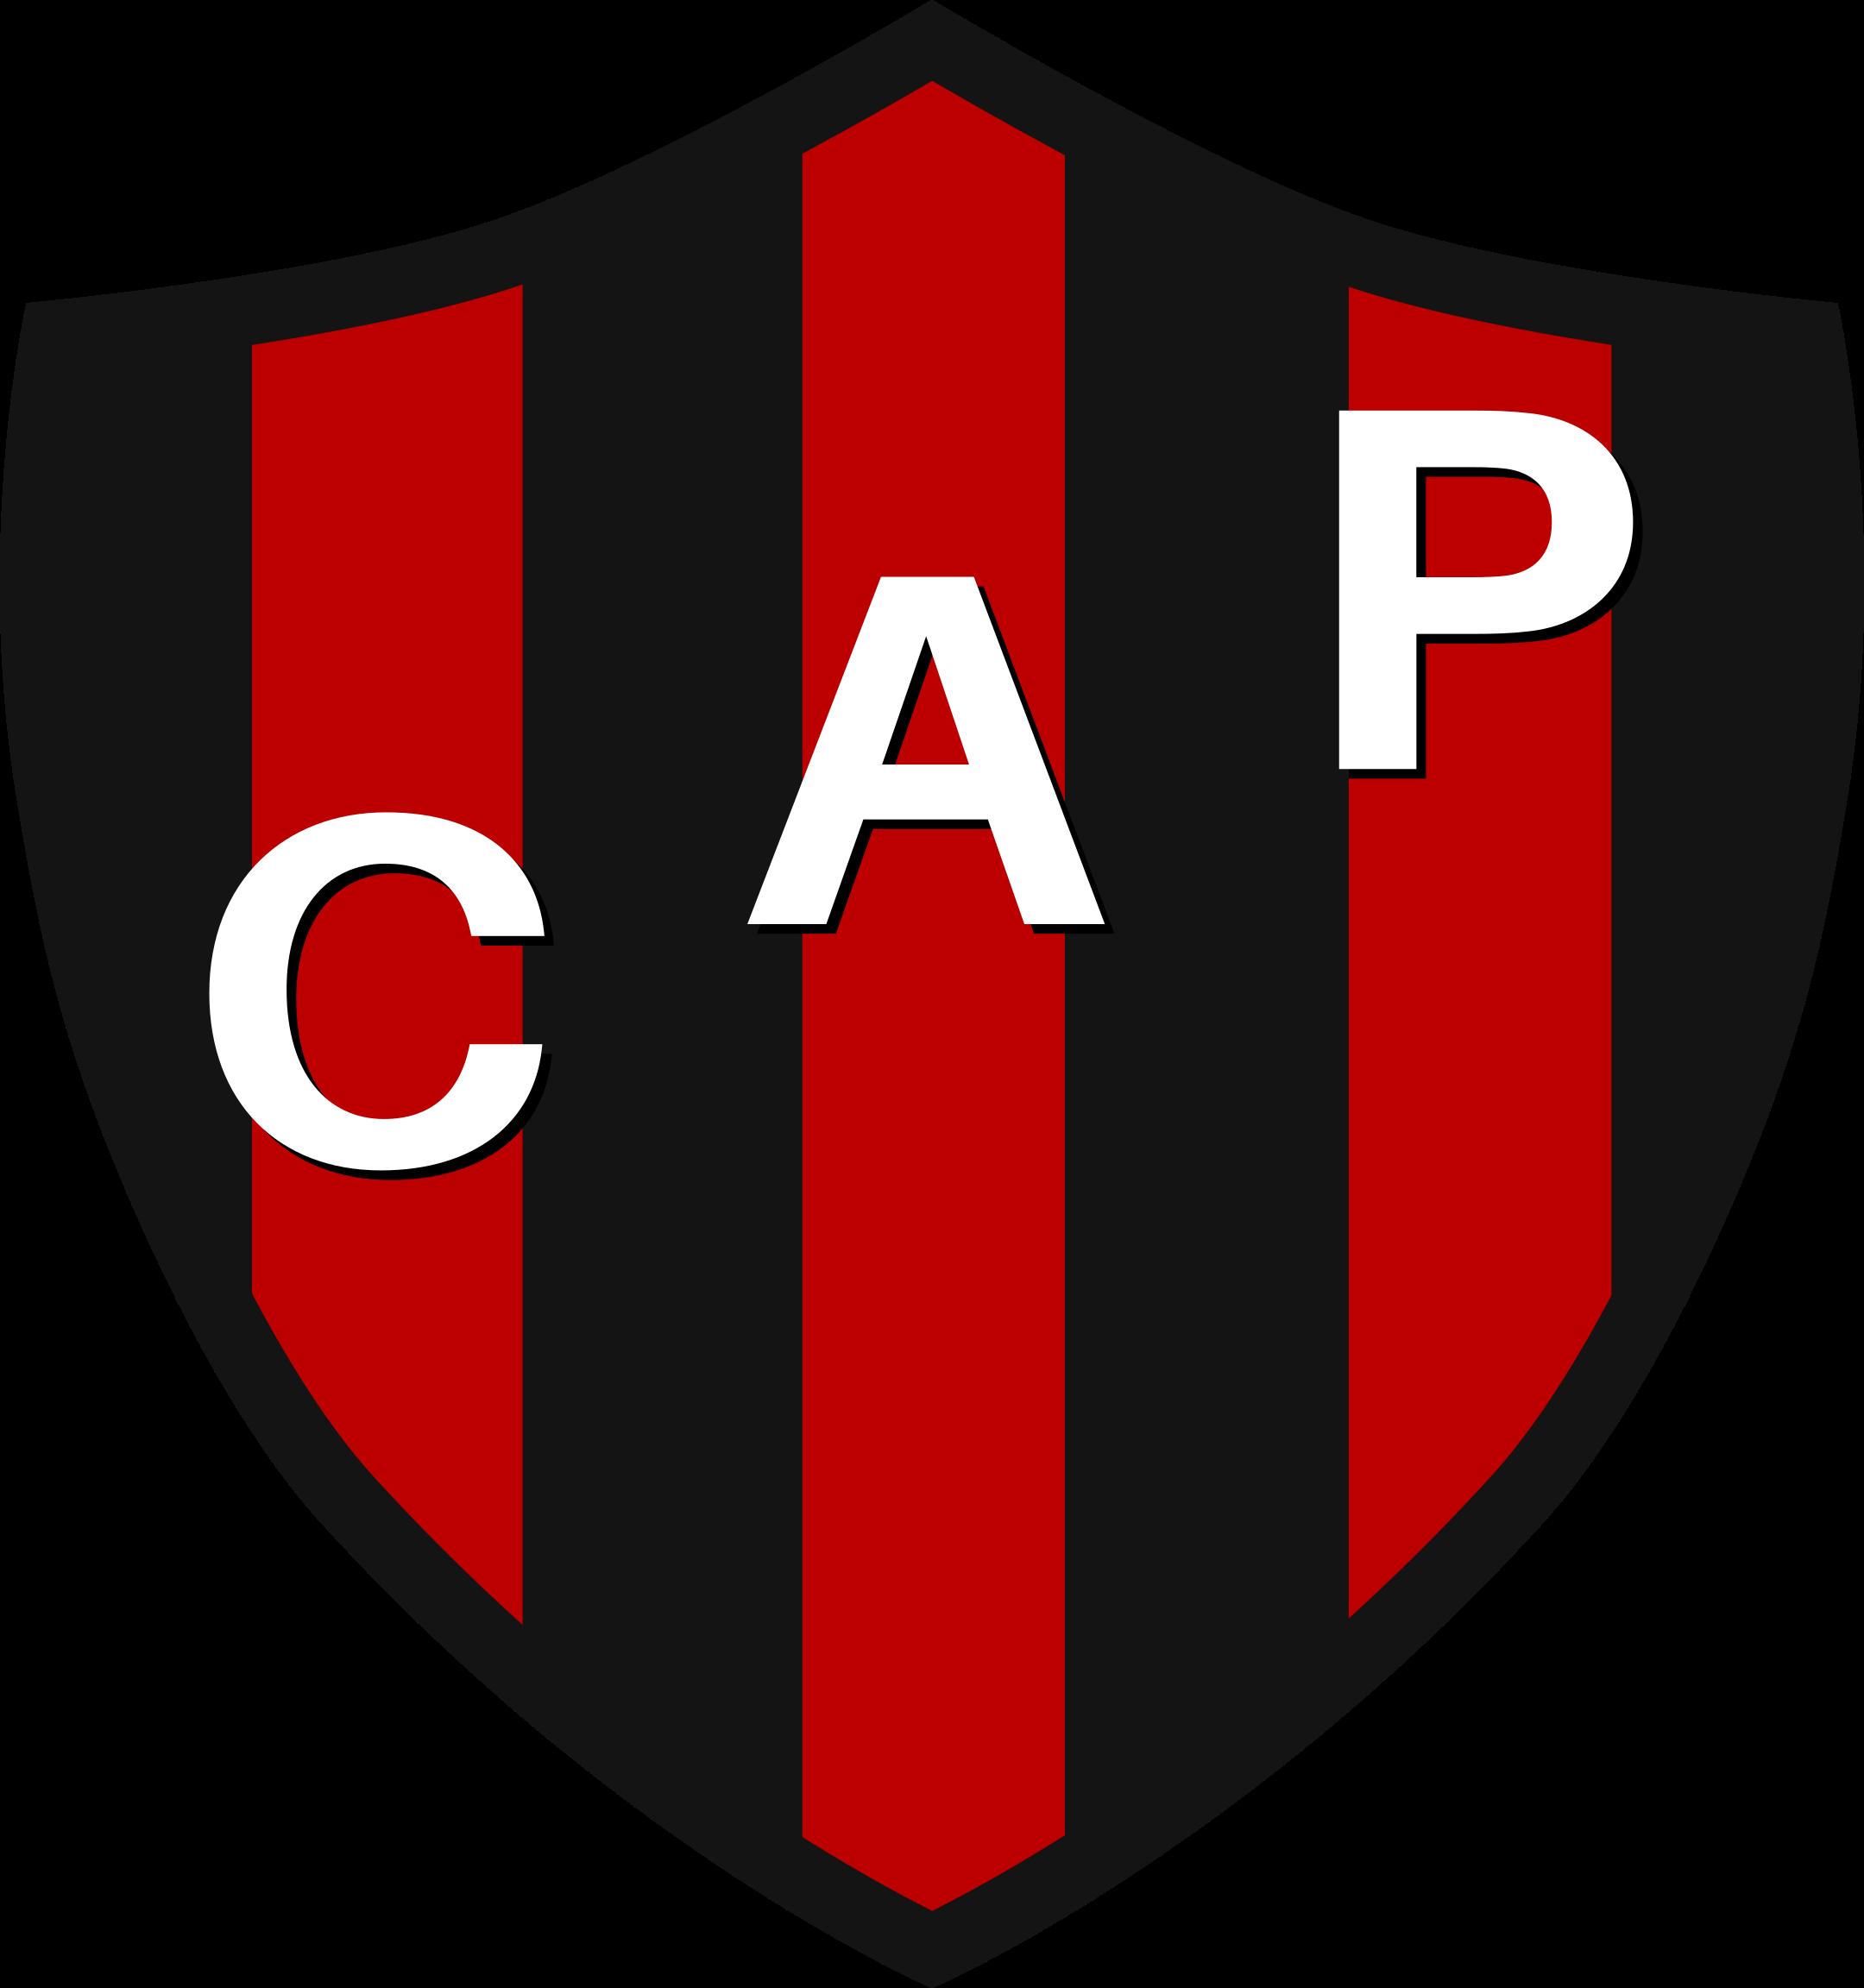 ca patronato logo 1 - Club Atlético Patronato Logo – Escudo